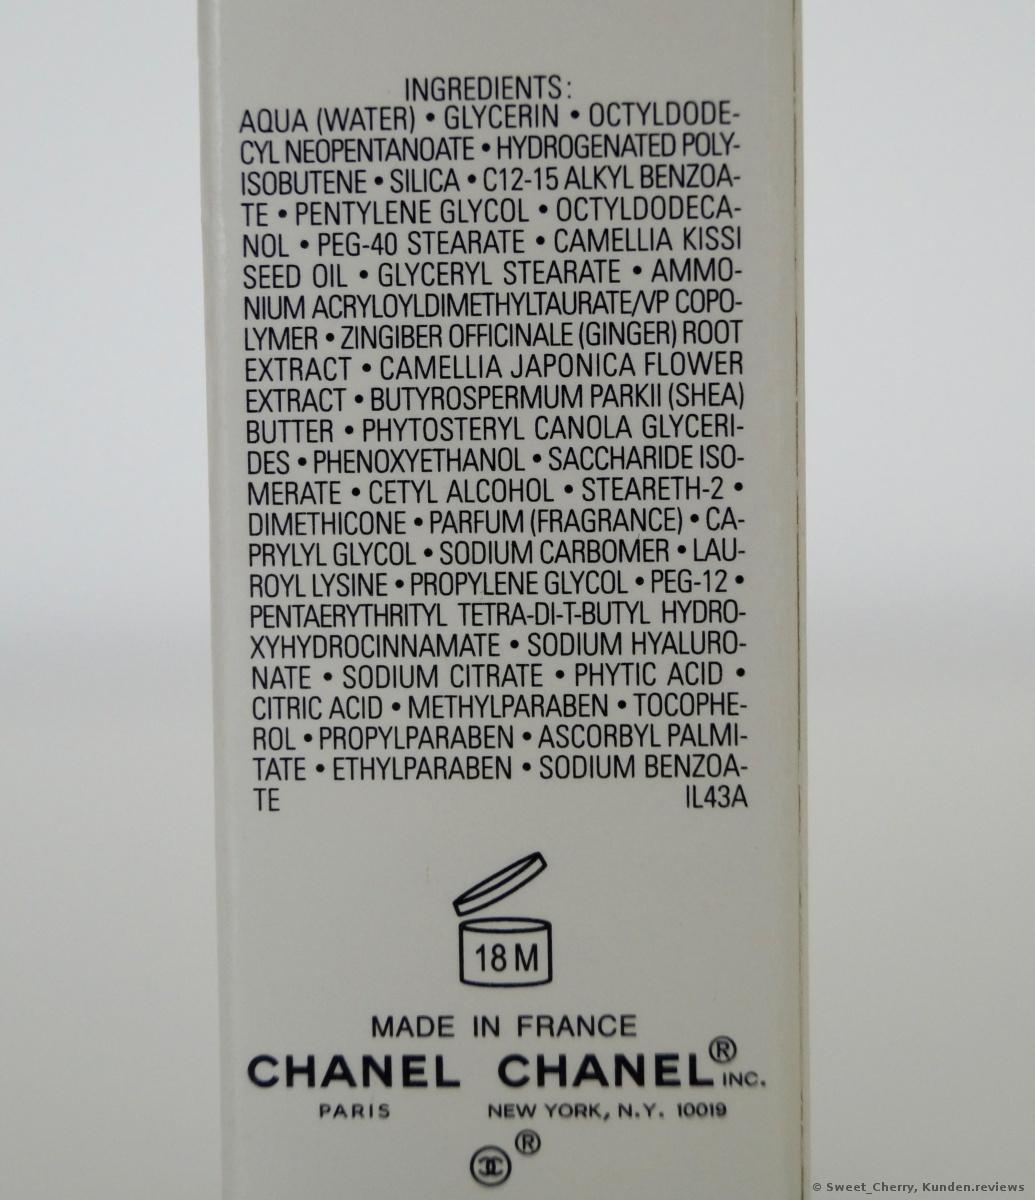 Chanel - FEUCHTIGKEITSPFLEGE HYDRA BEAUTY CRÈME